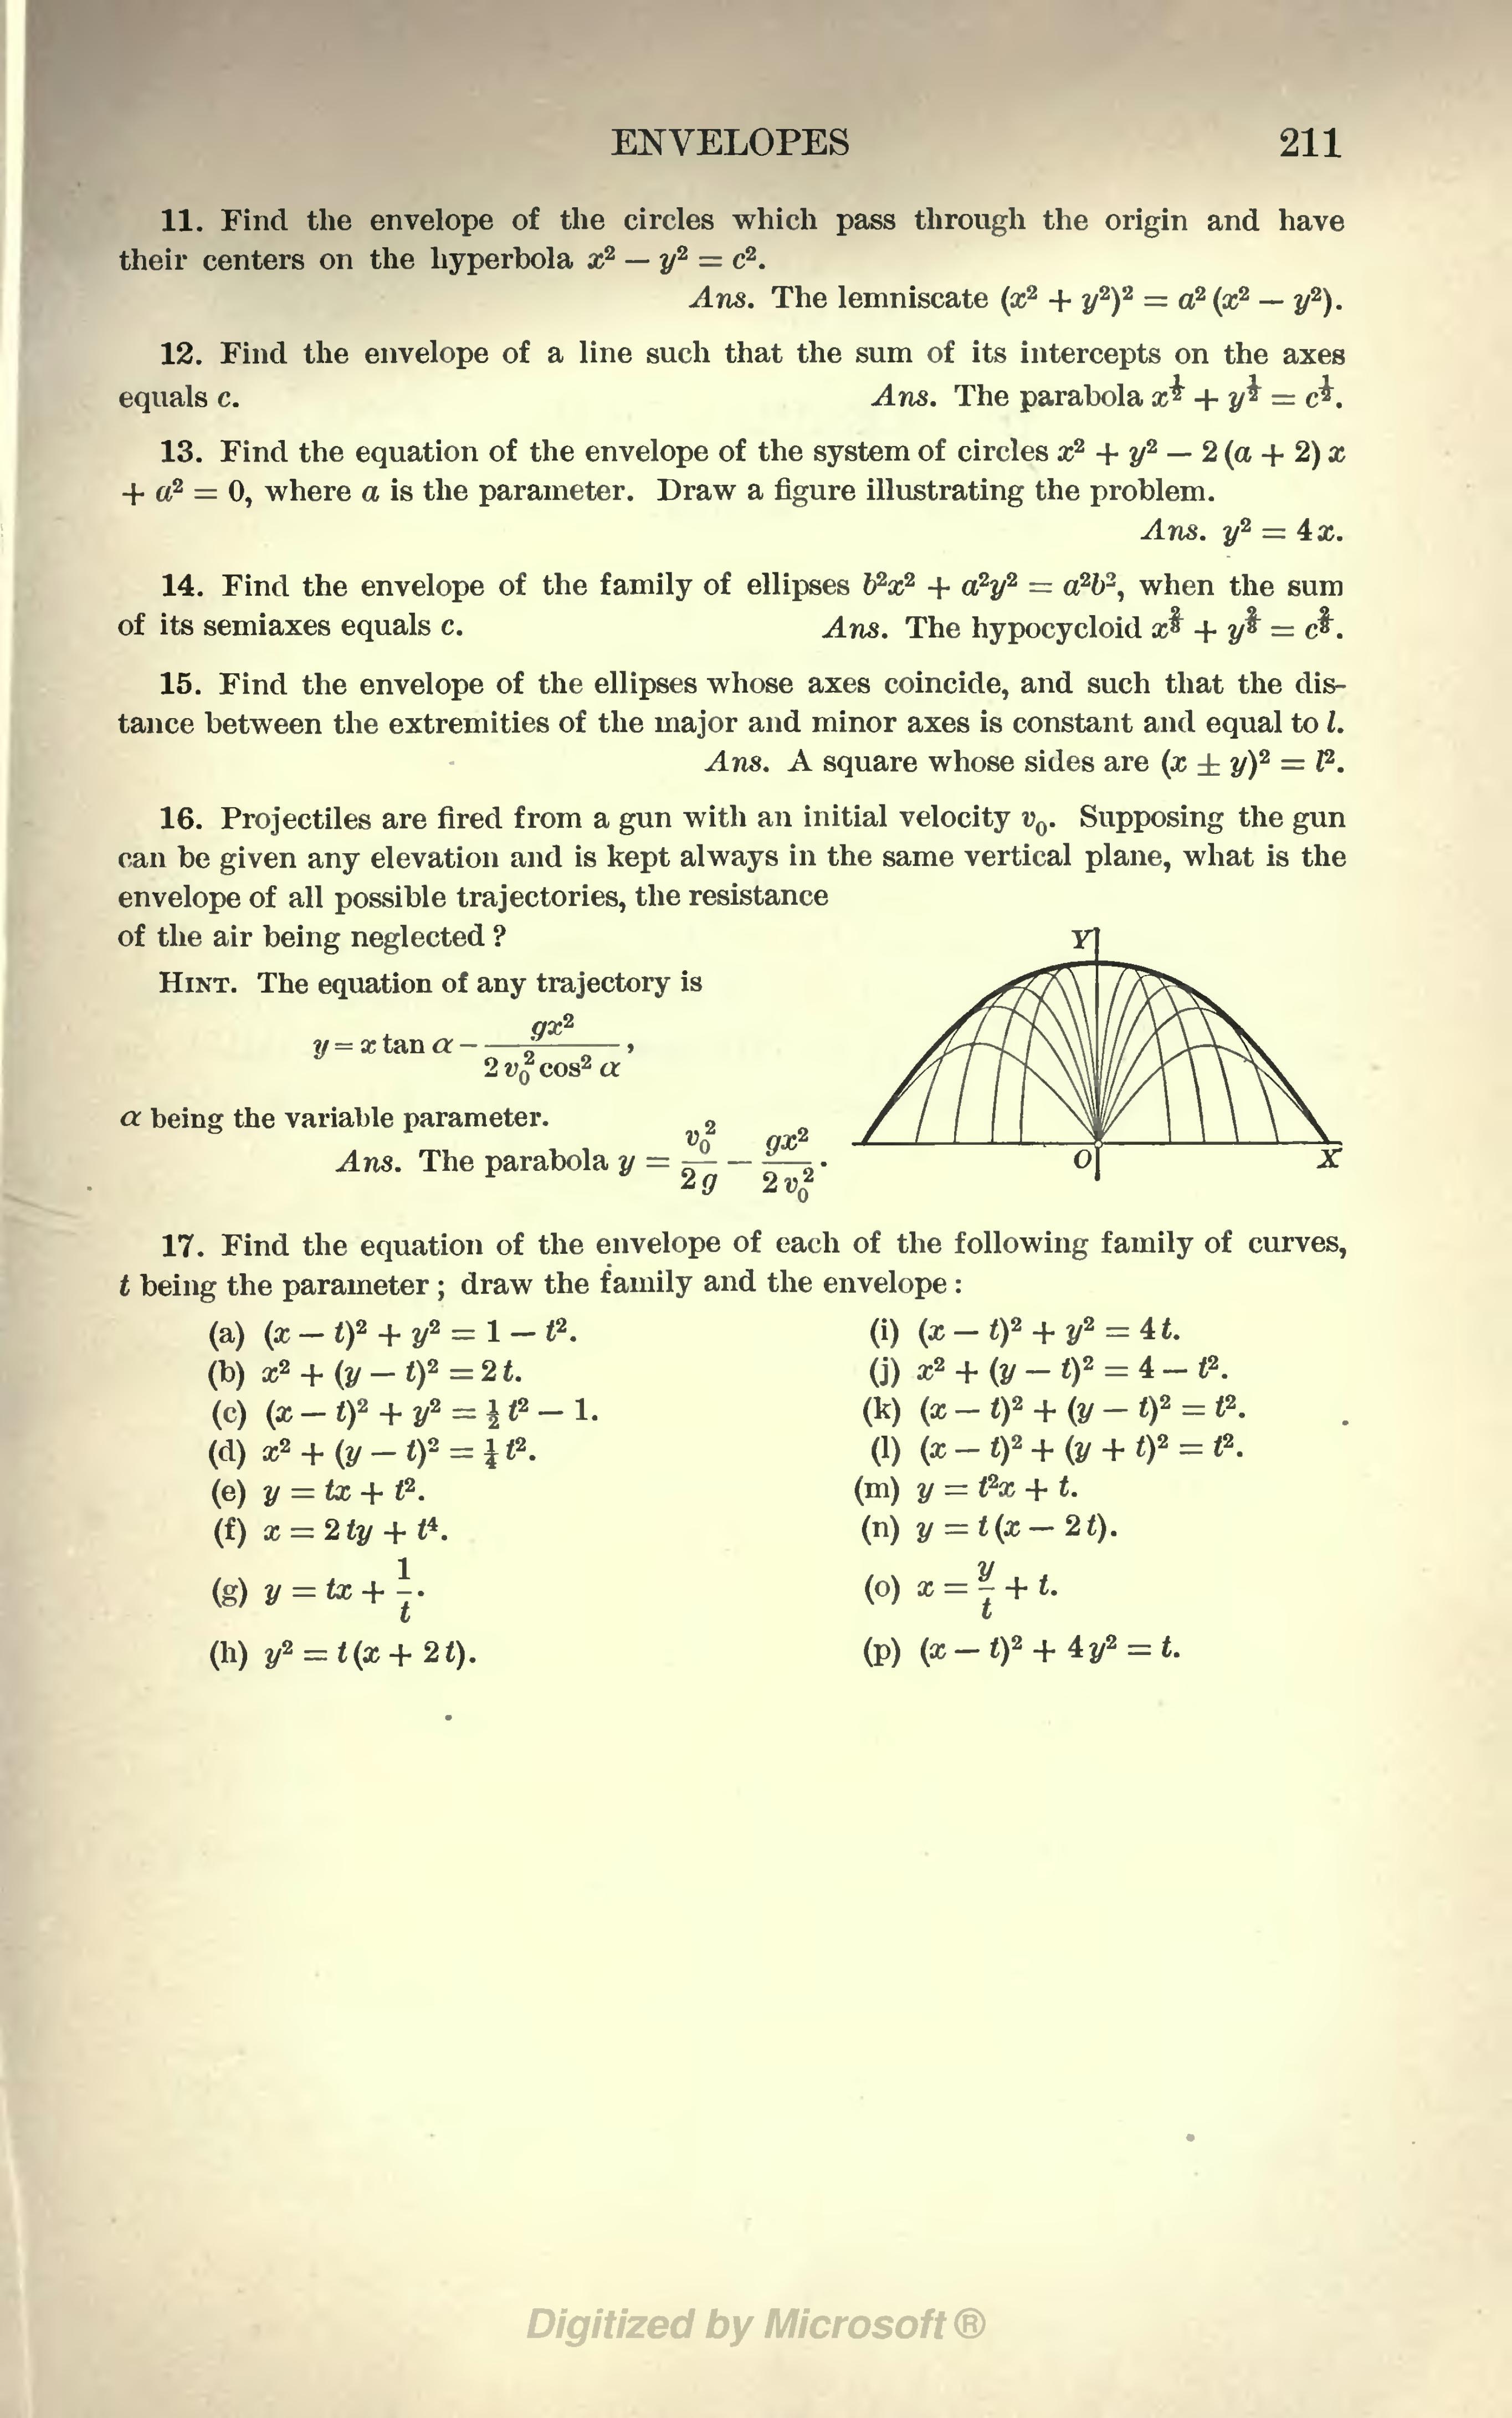 differential calculus formulas pdf free download